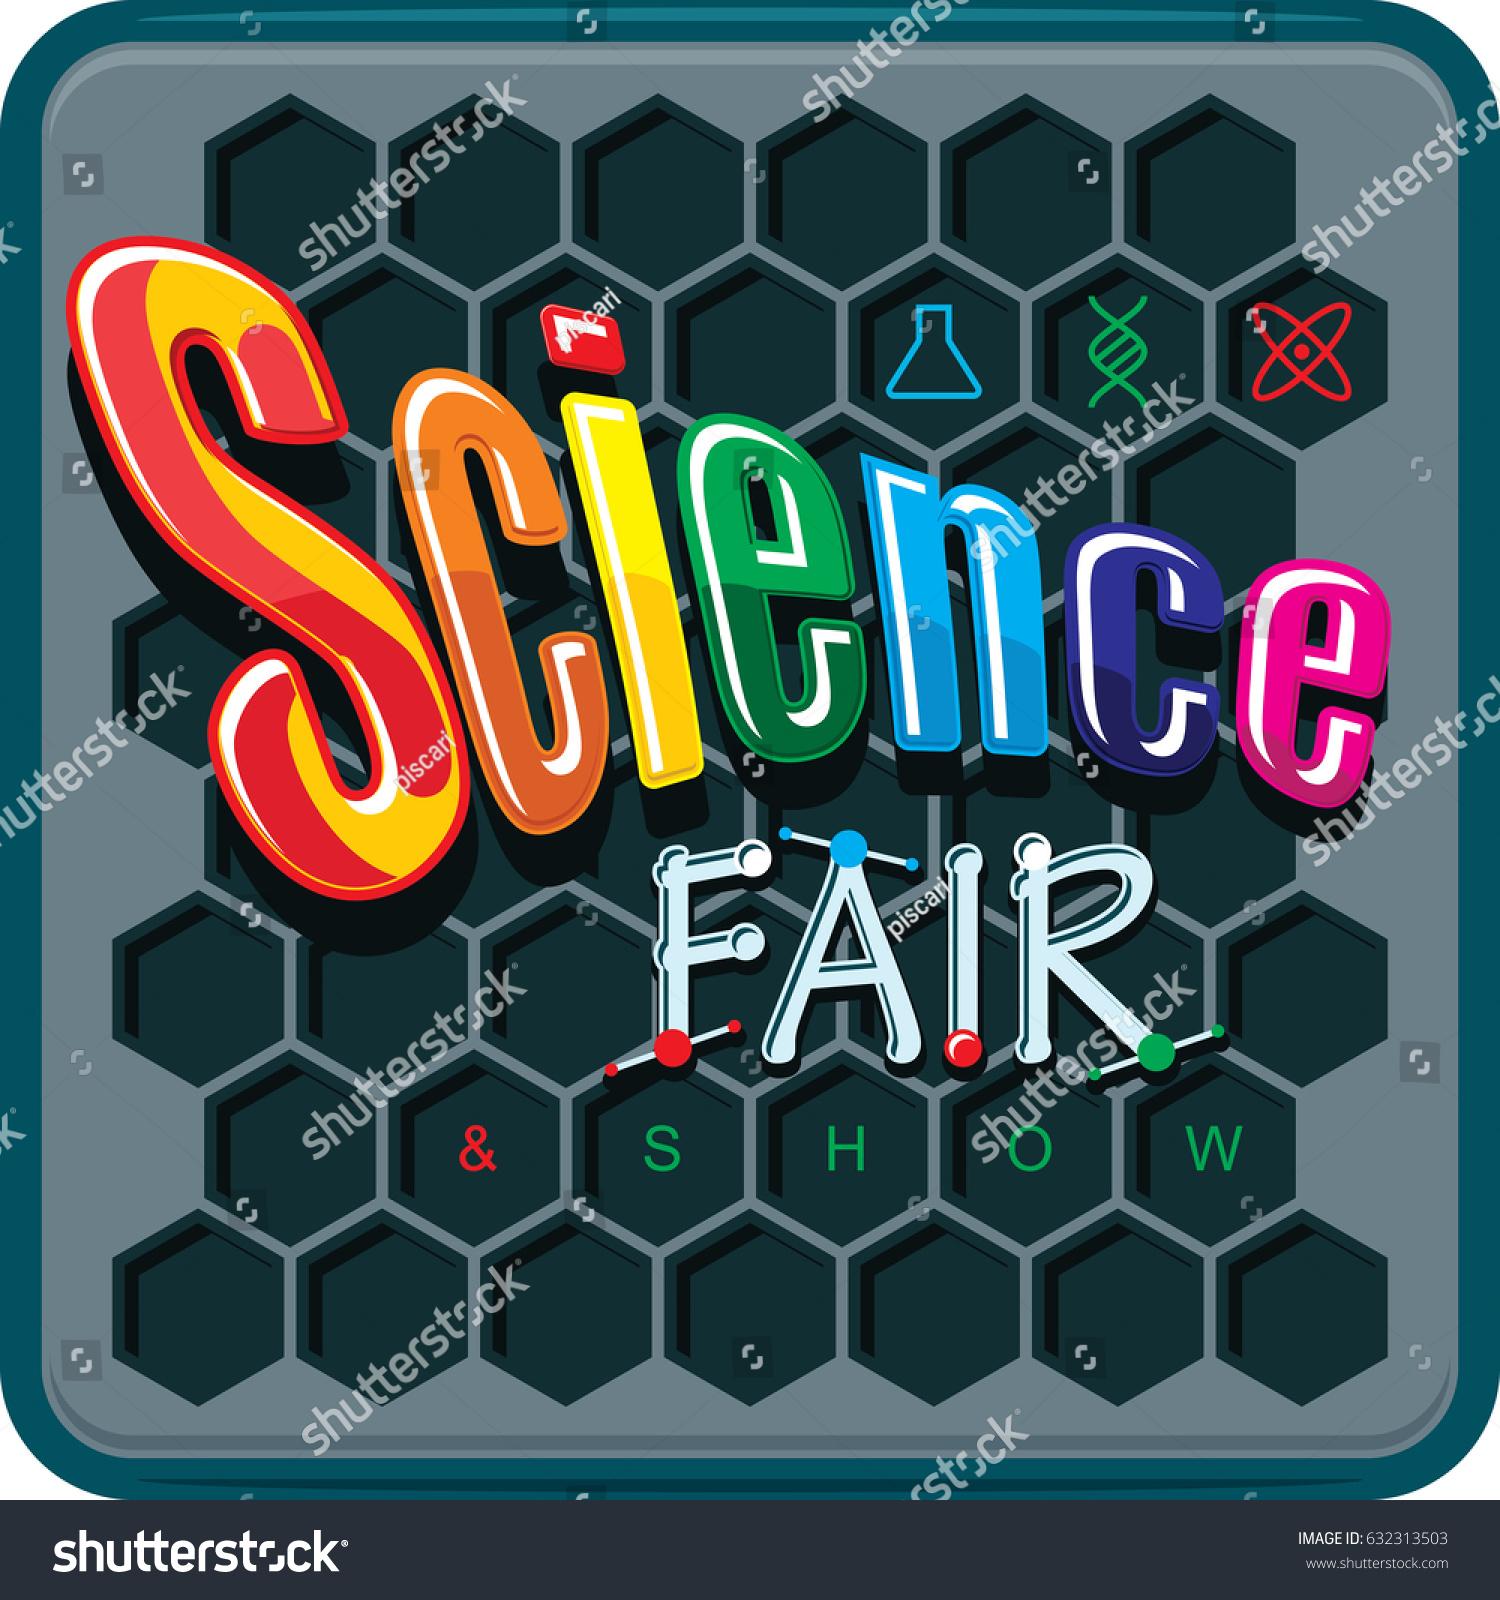 Science Fair Card Design Vector Illustration Stock Vector